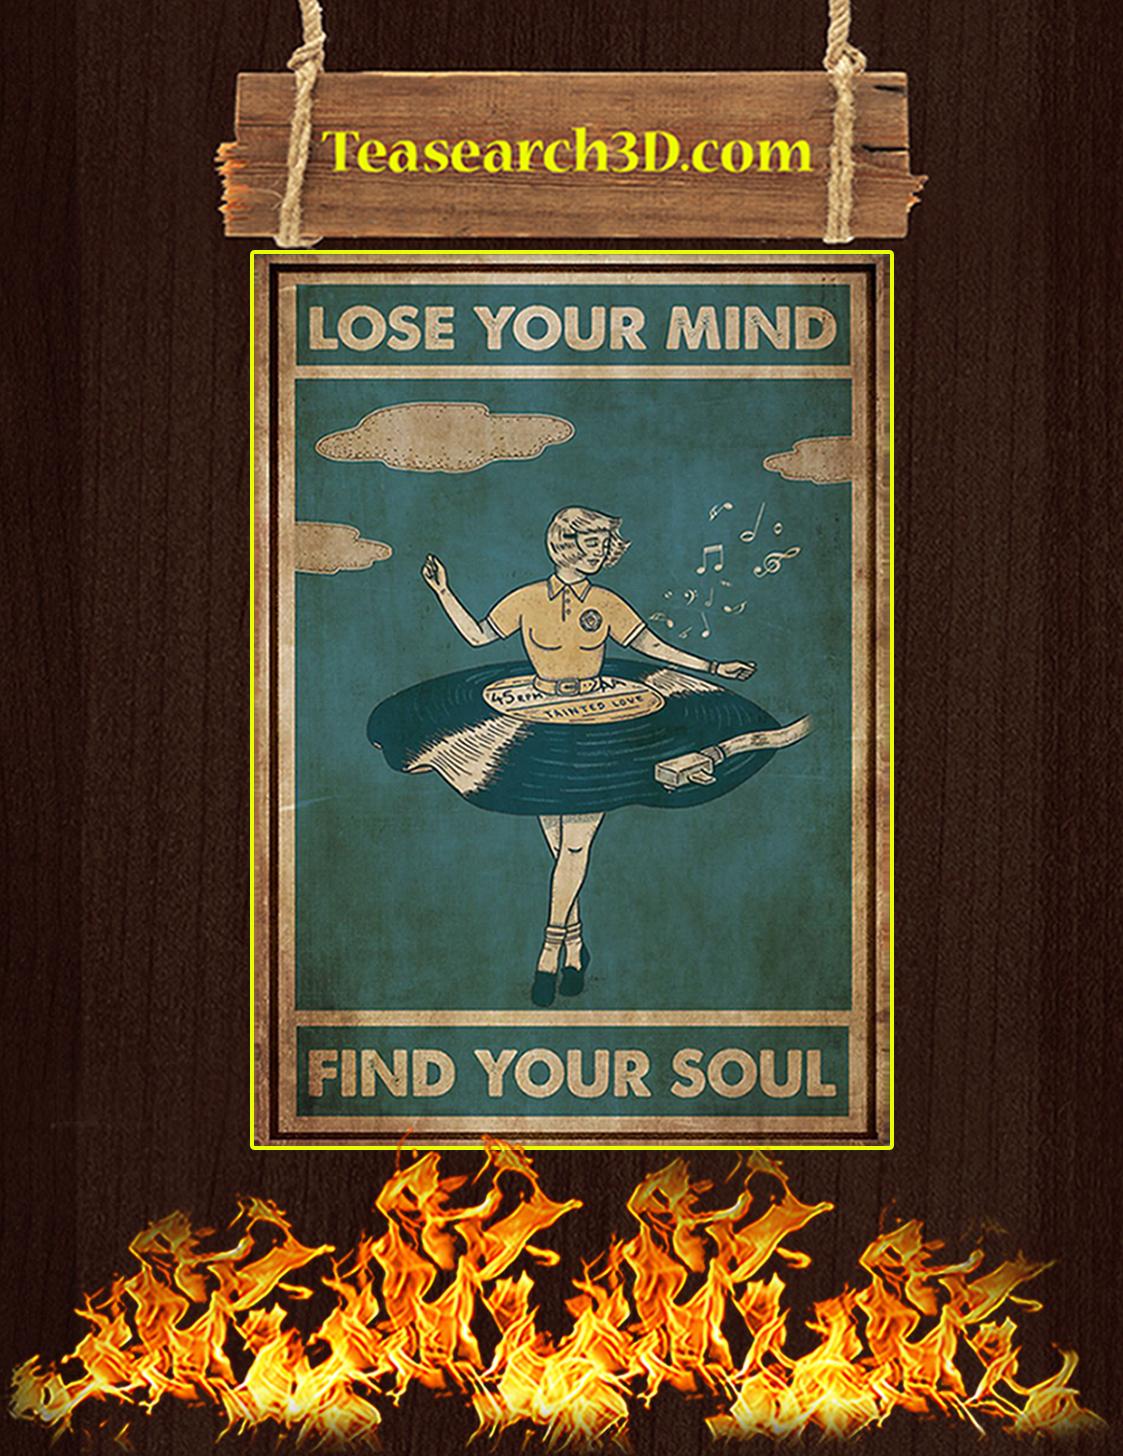 Vinyl dress lose your mind find your soul poster A3